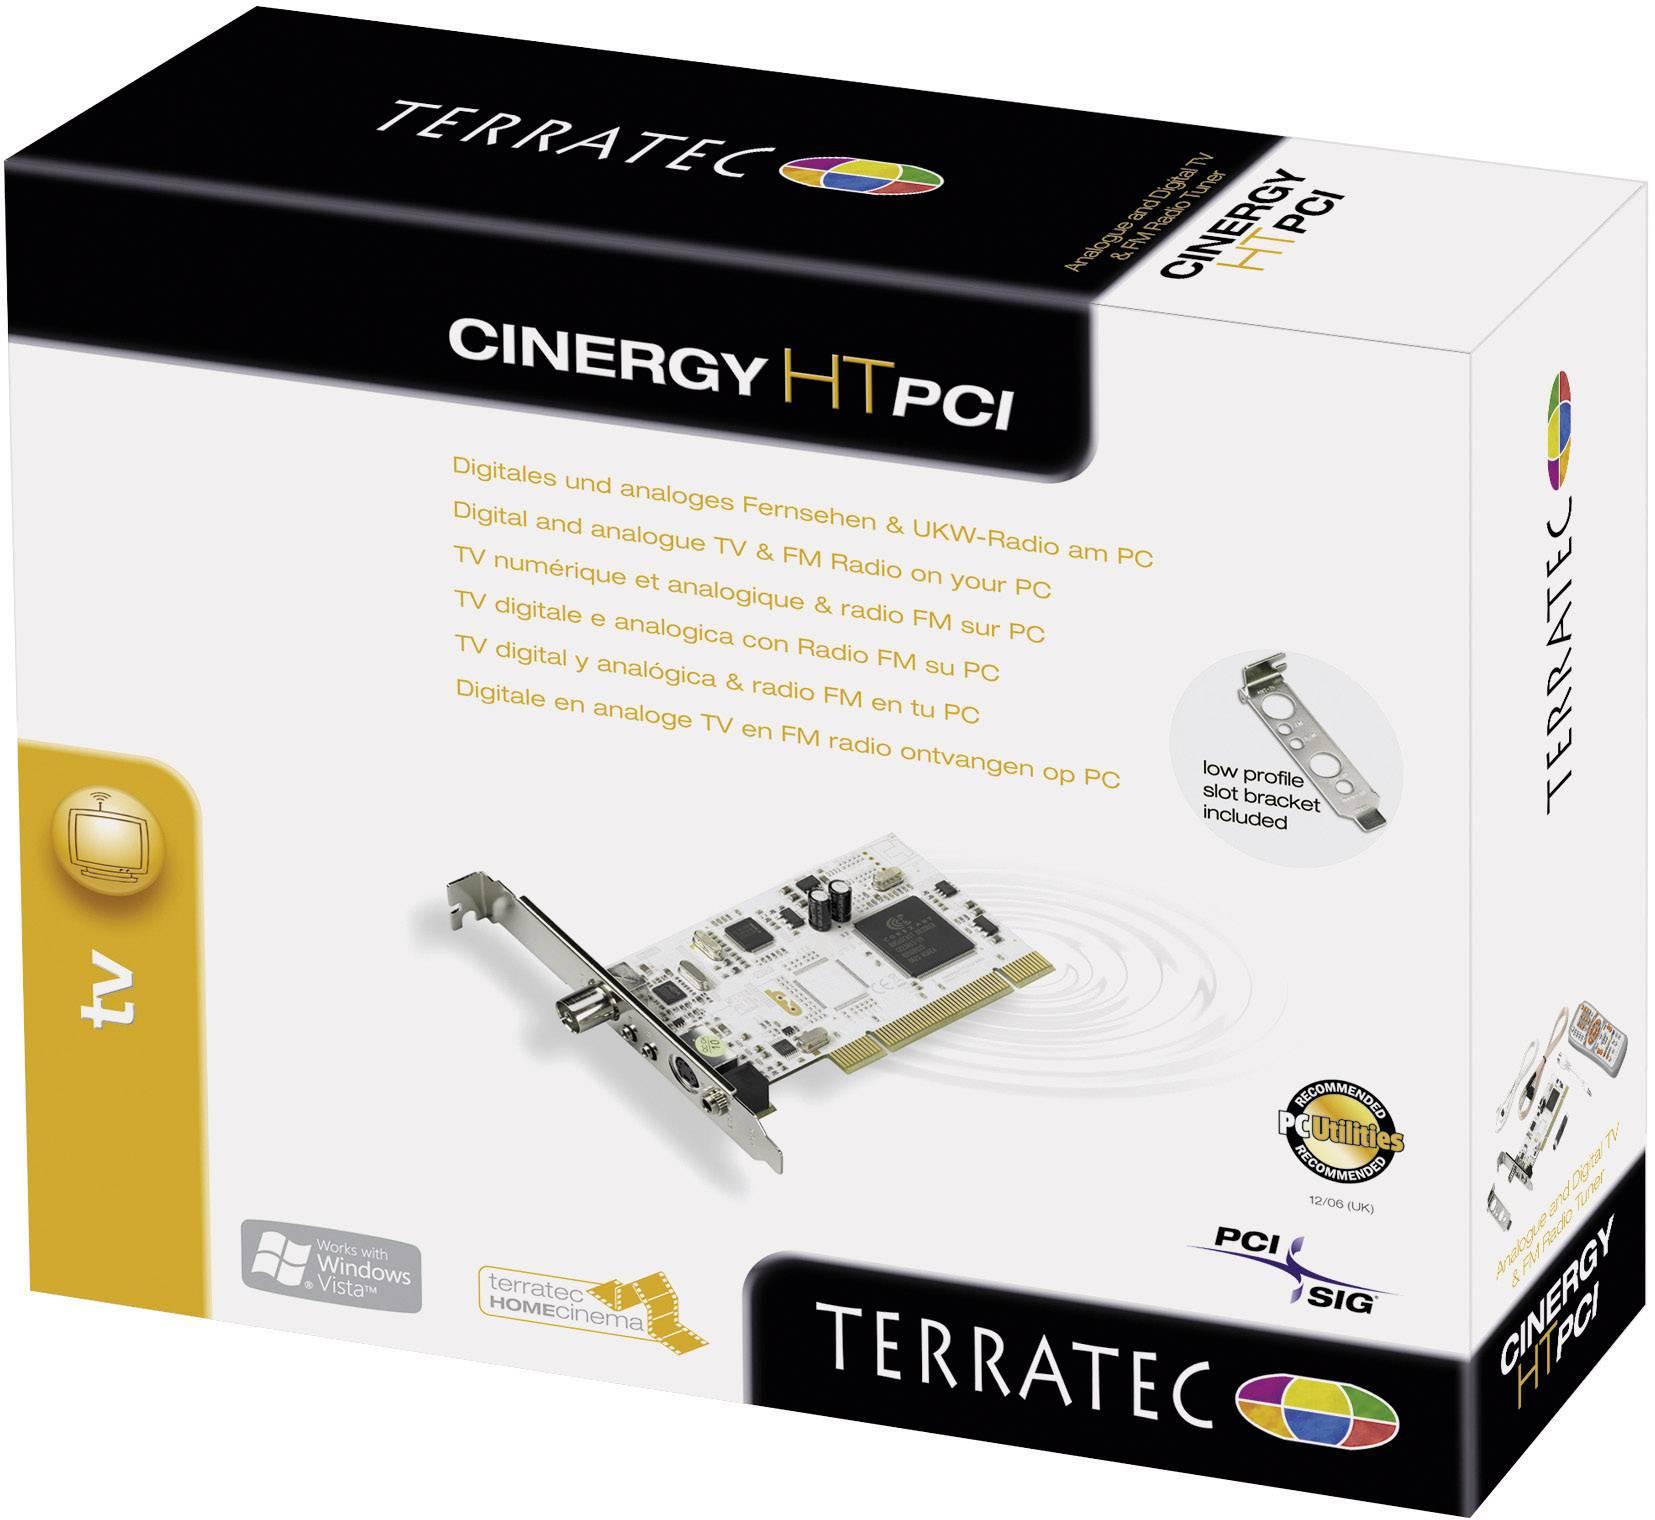 TerraTec Cinergy HT PCI TV Tuner Windows